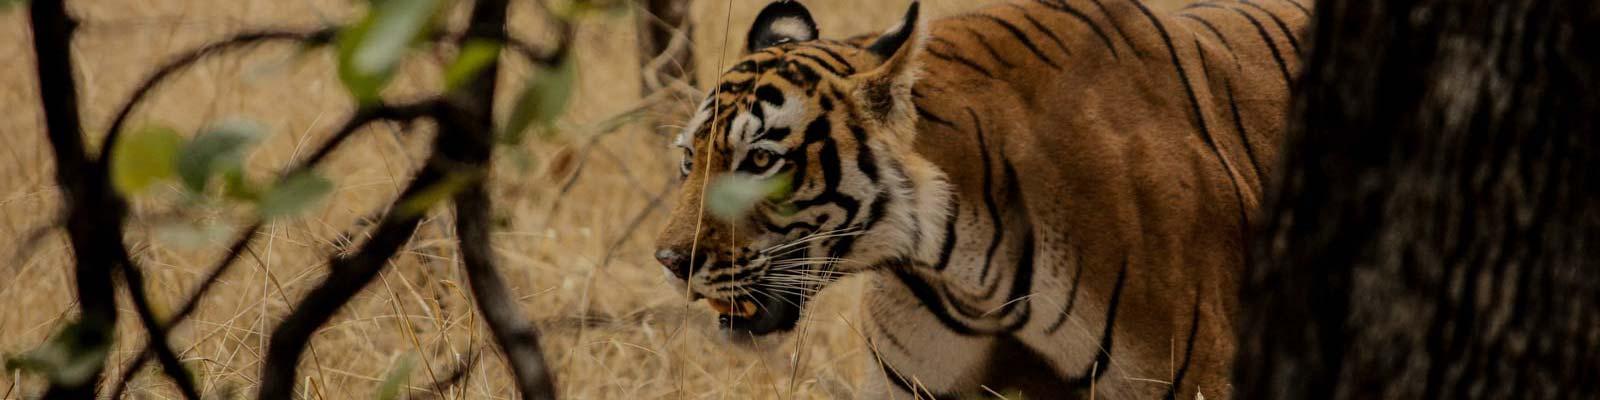 ranthambor tiger featured